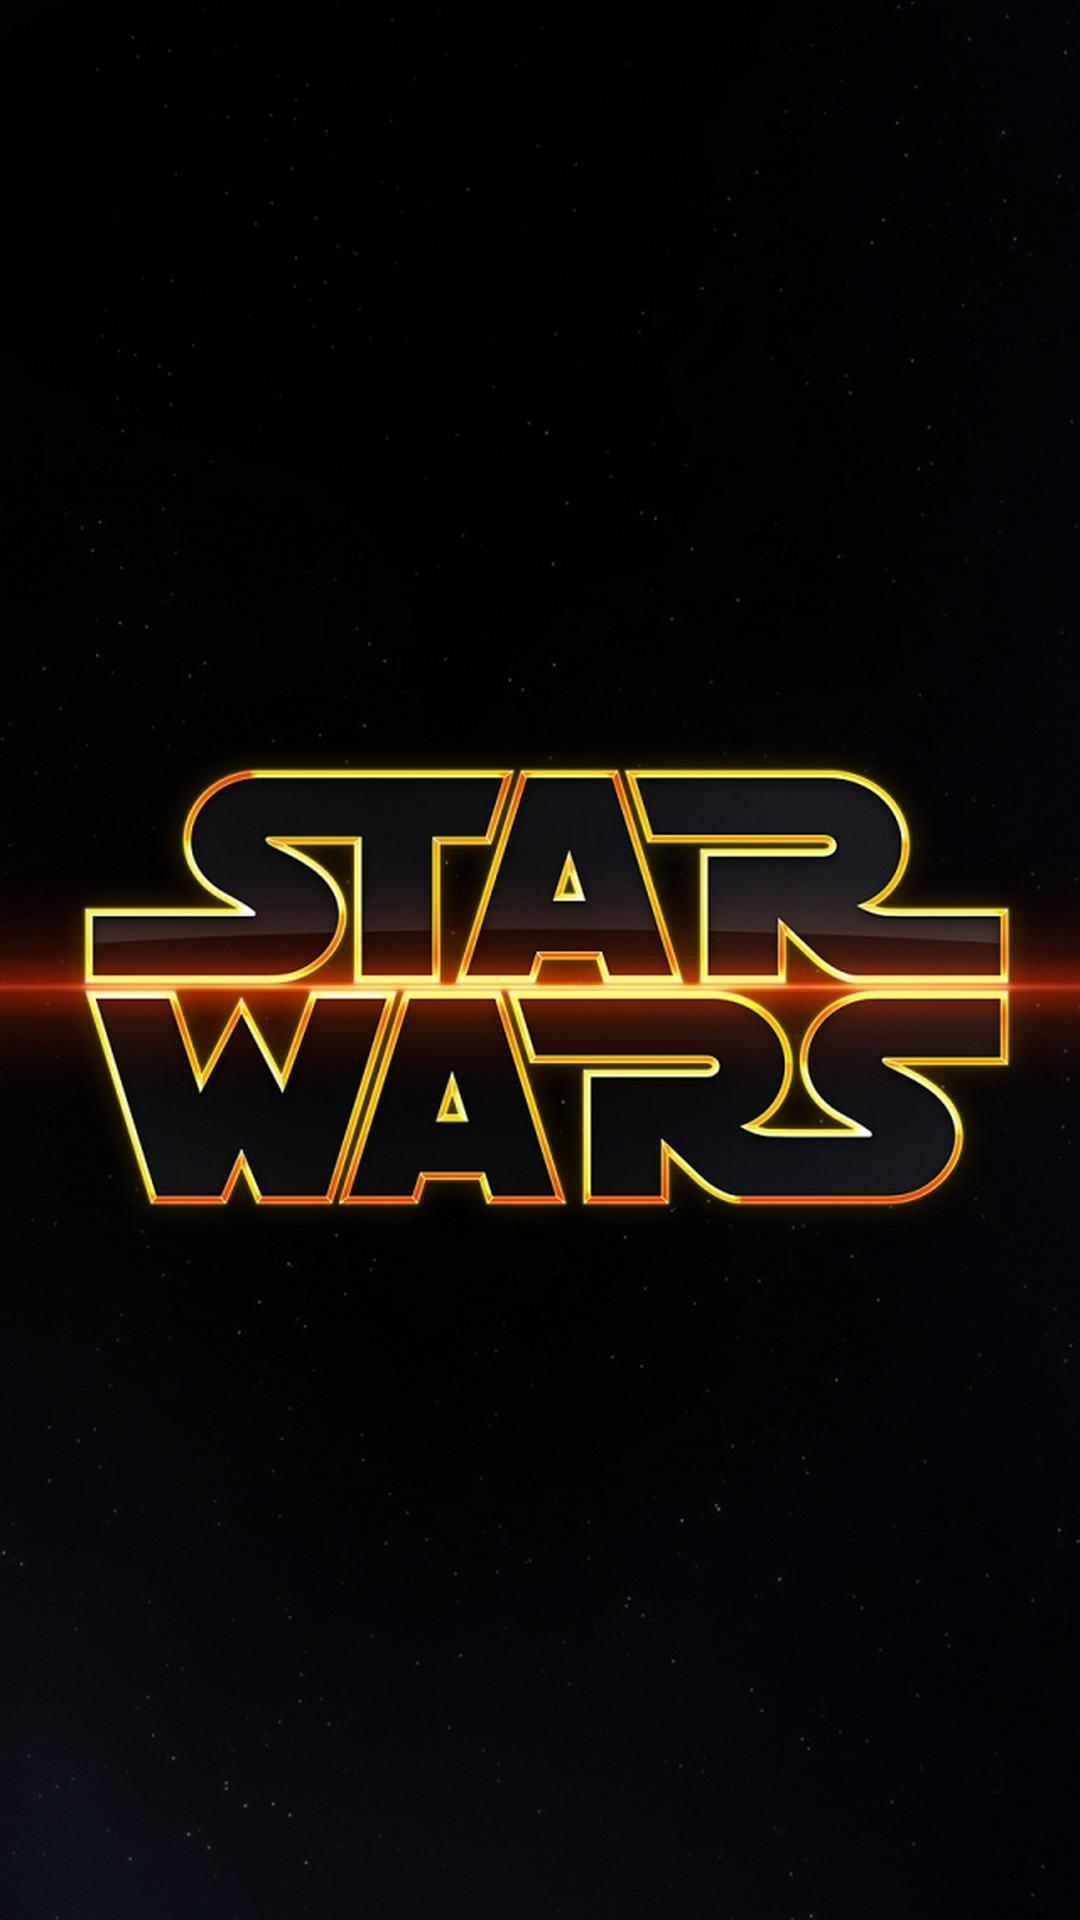 Star Wars Logo Star Wars Logo Wallpaper Iphone 11 1080x1920 Download Hd Wallpaper Wallpapertip